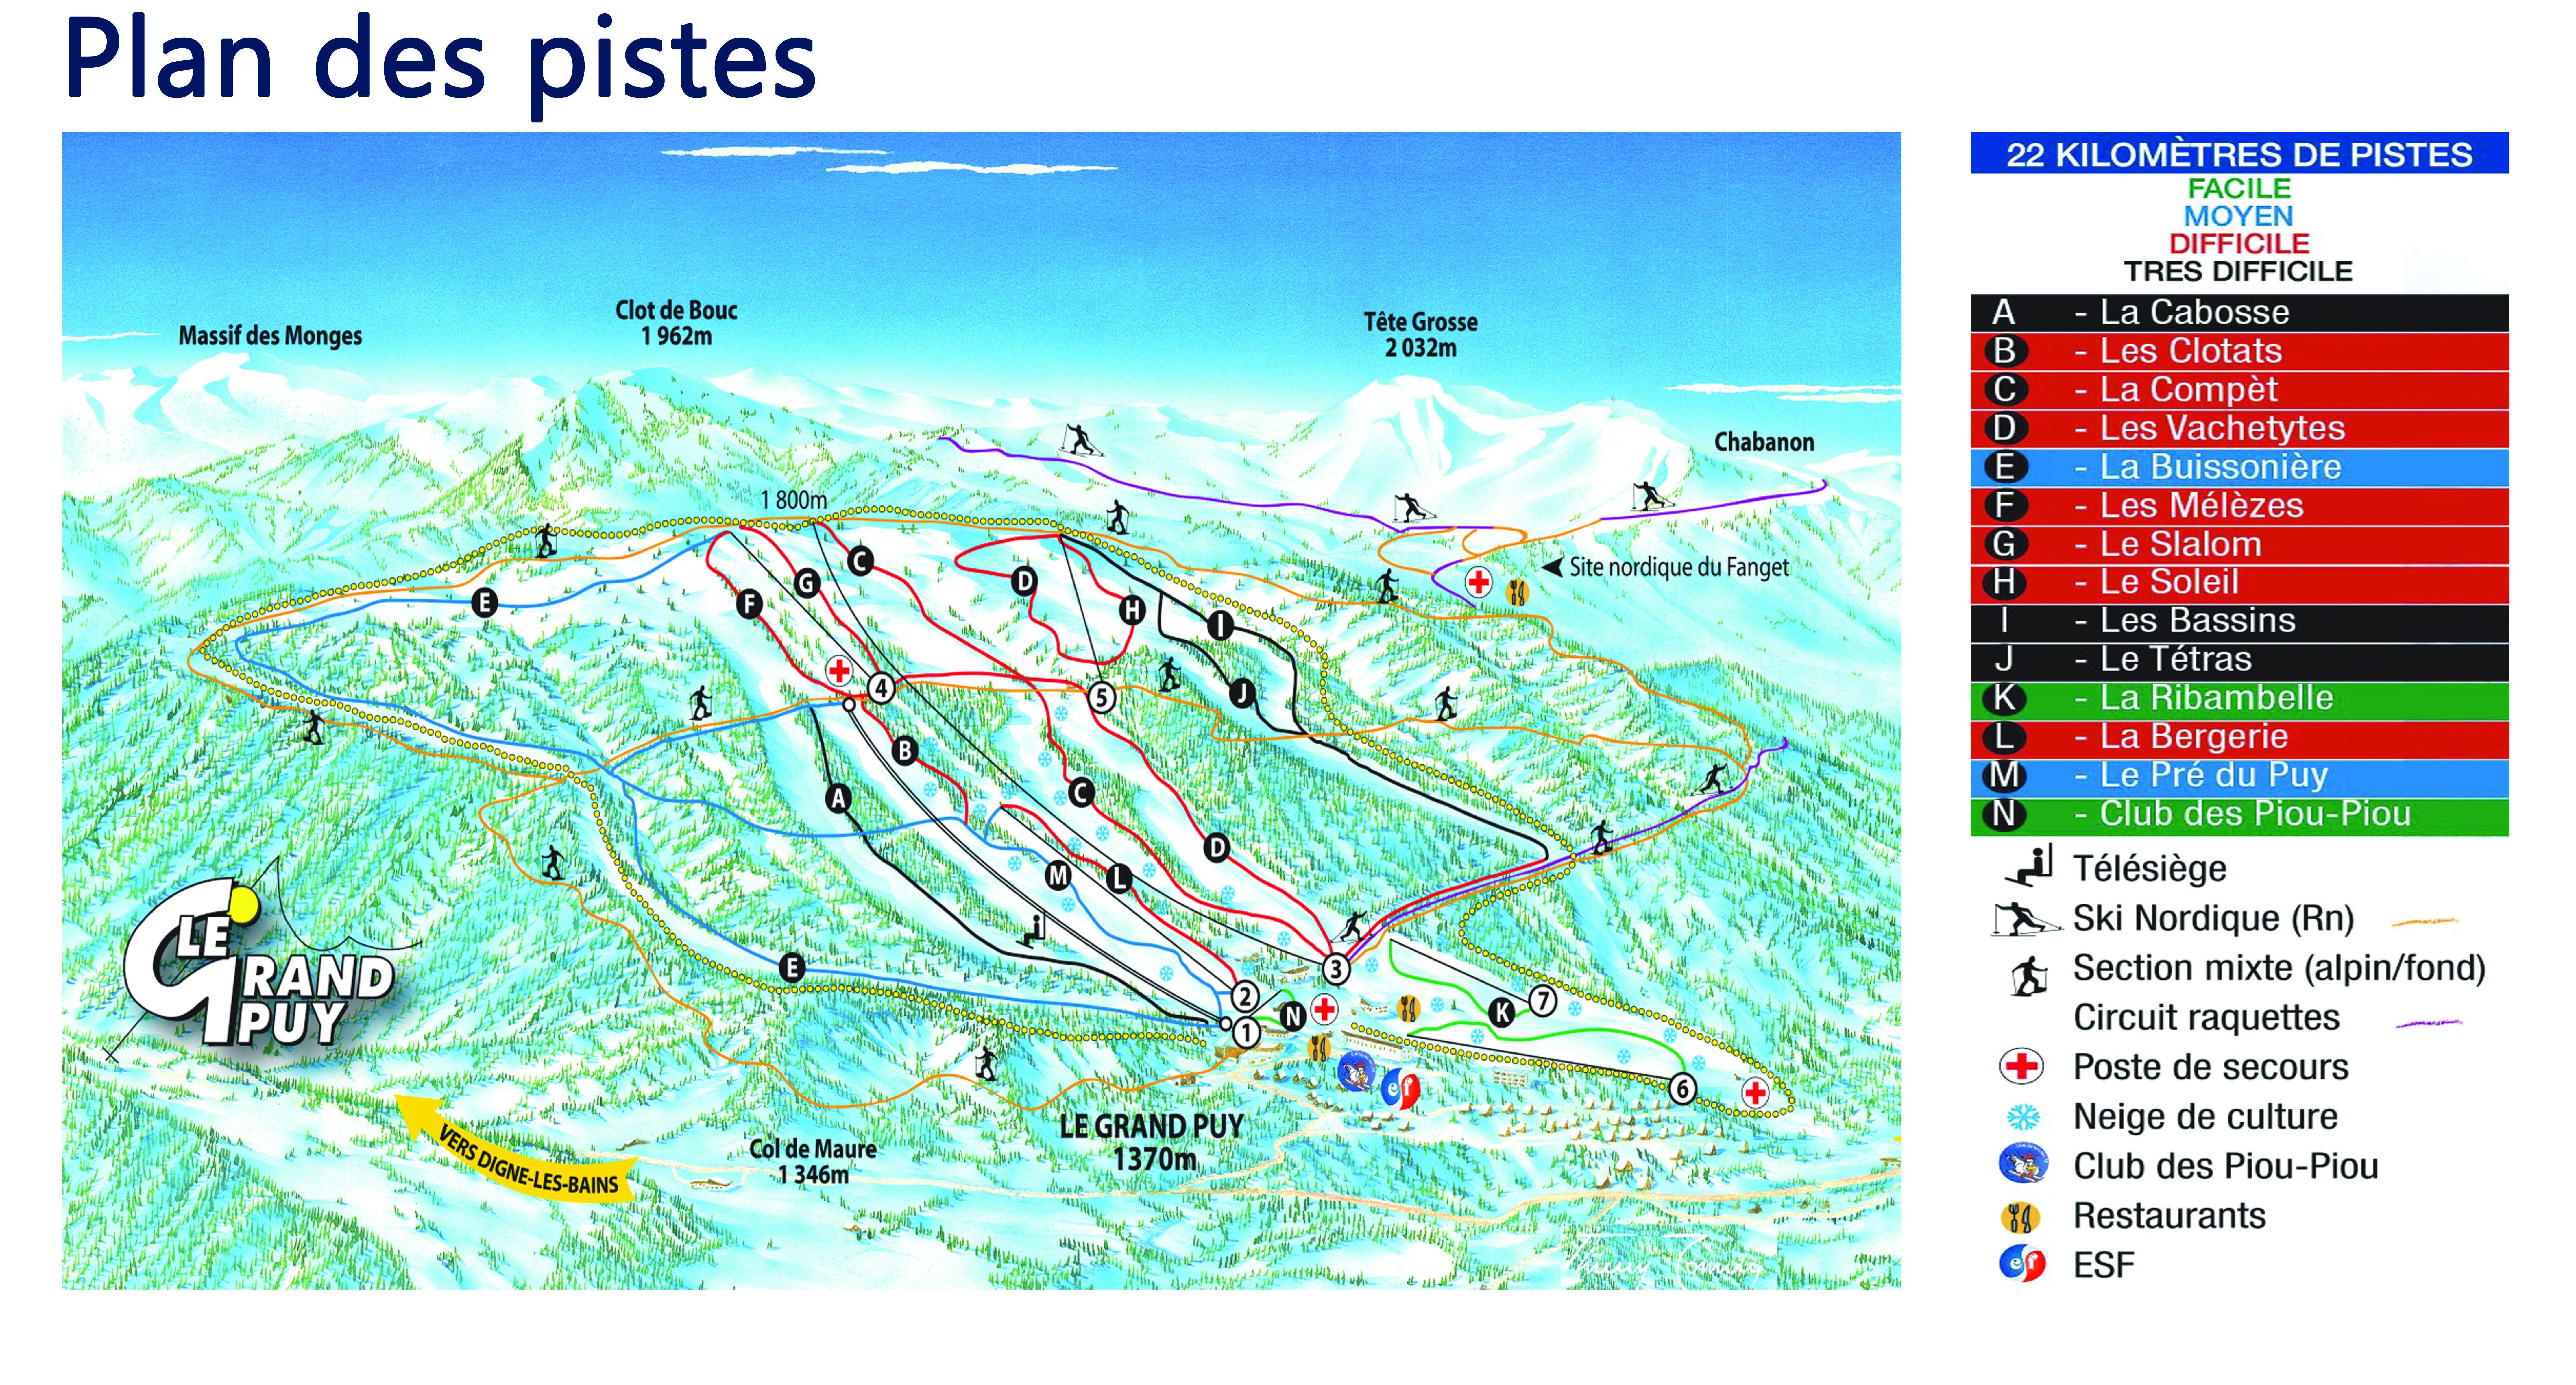 seyne les alpes france map Seyne Les Alpes Ski Resort Guide Snow Forecast Com